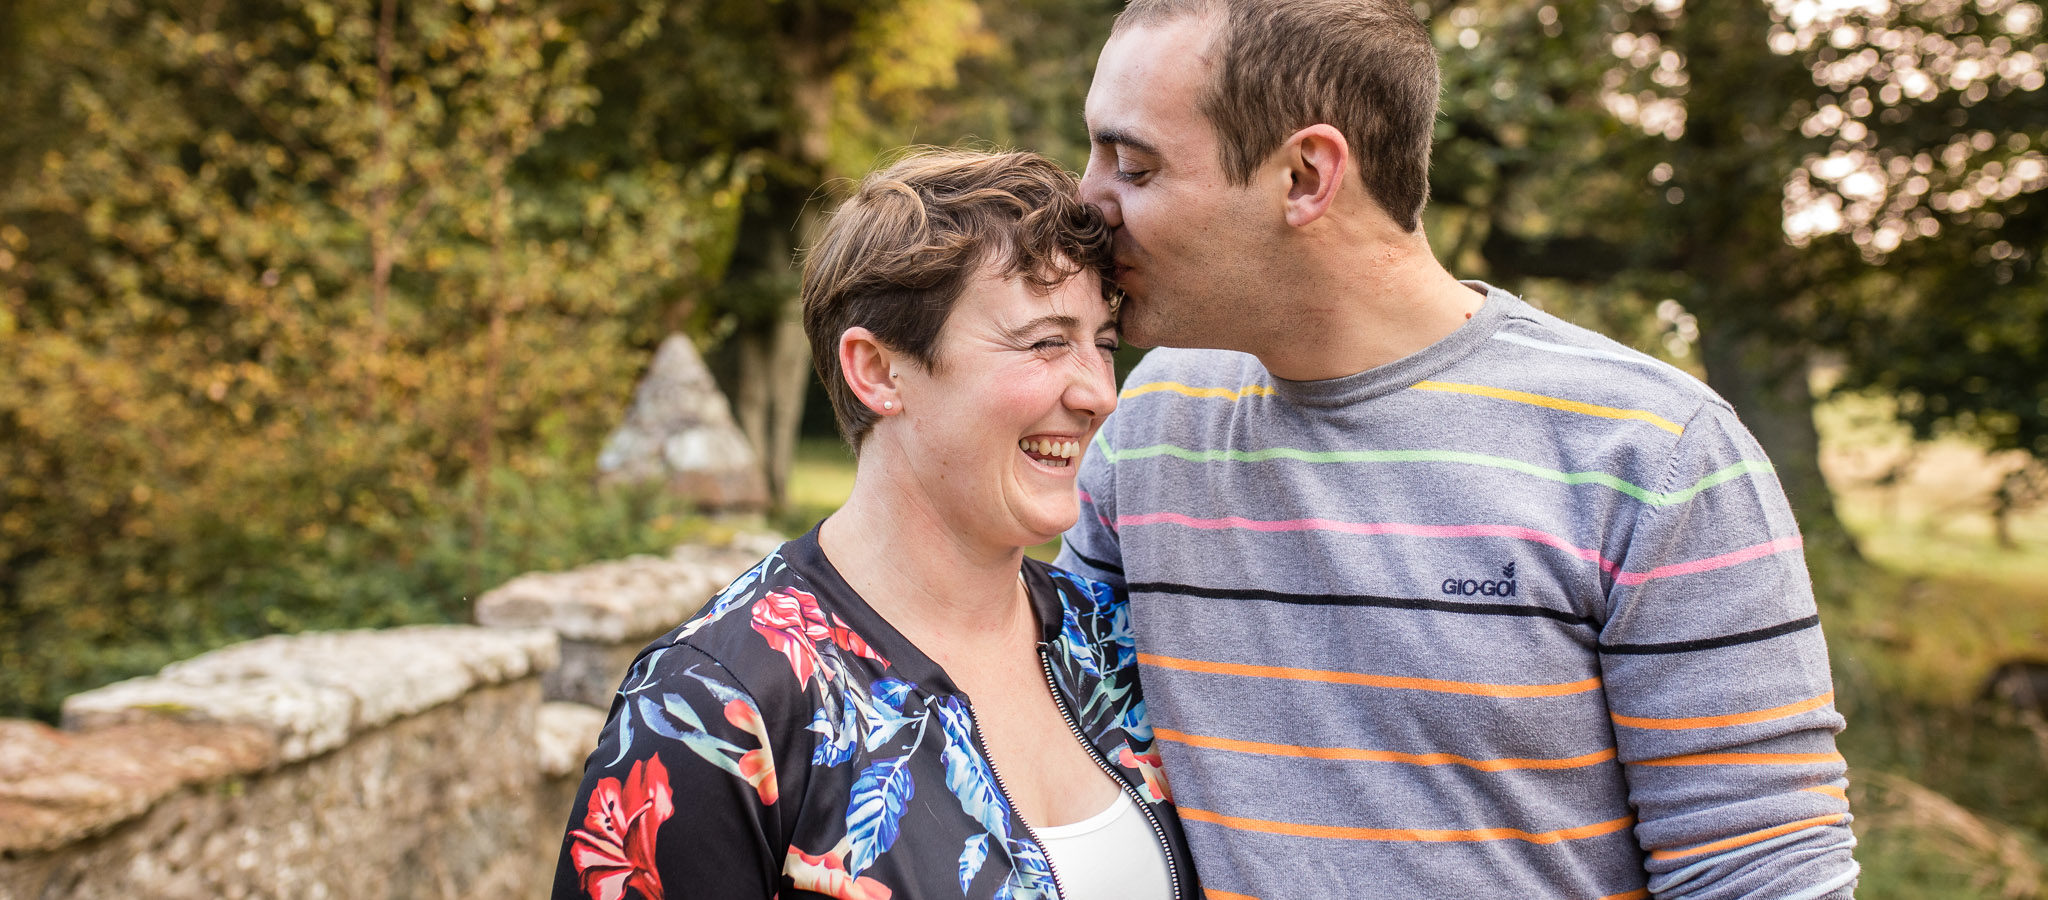 Engagement couple - wedding photographer aberdeen - scottish weddings - debbie dee photography